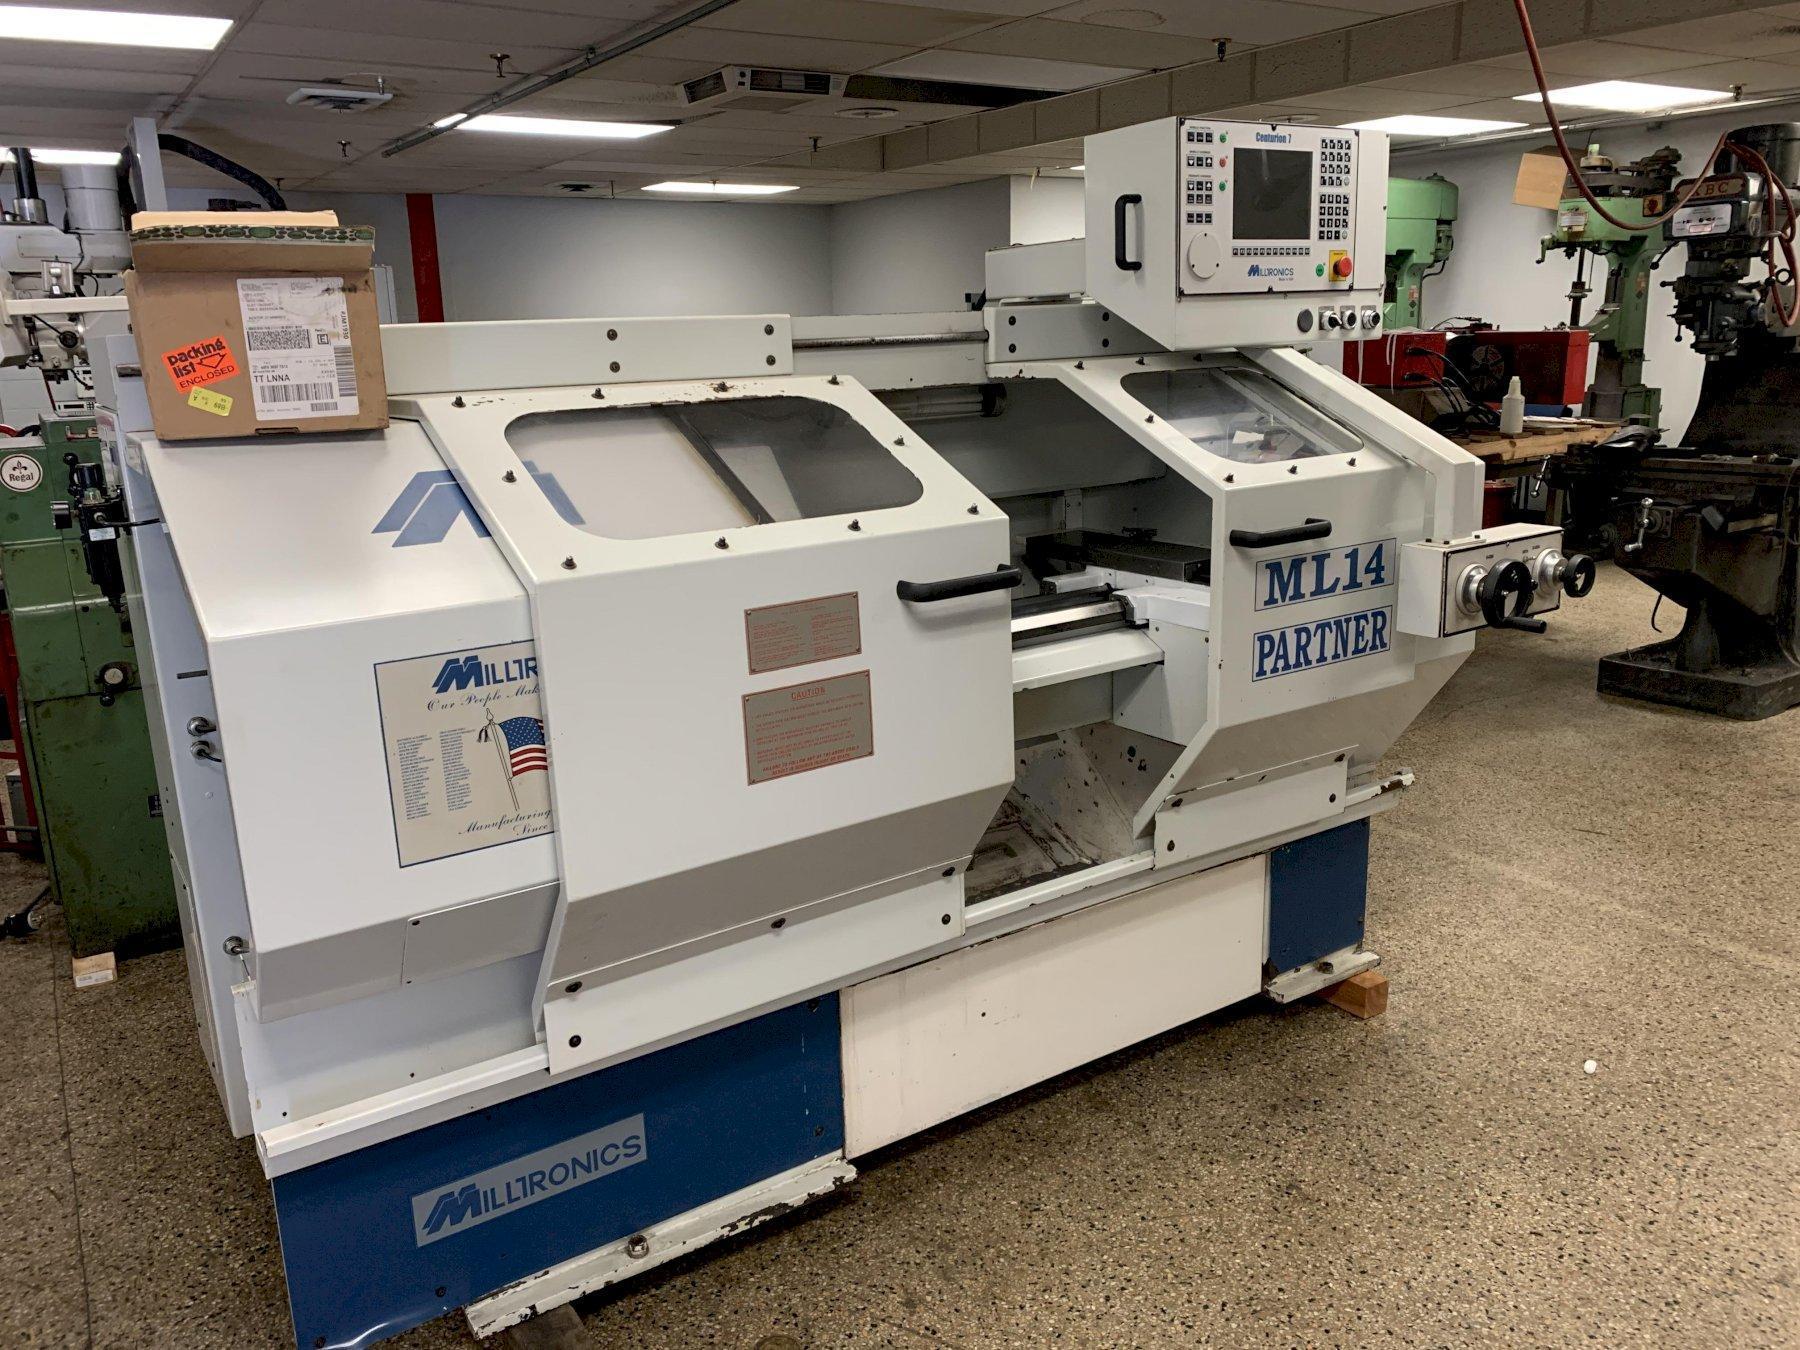 Milltronics Model ML-14 CNC Flat Bed Lathe, S/N 8212, New 2004.